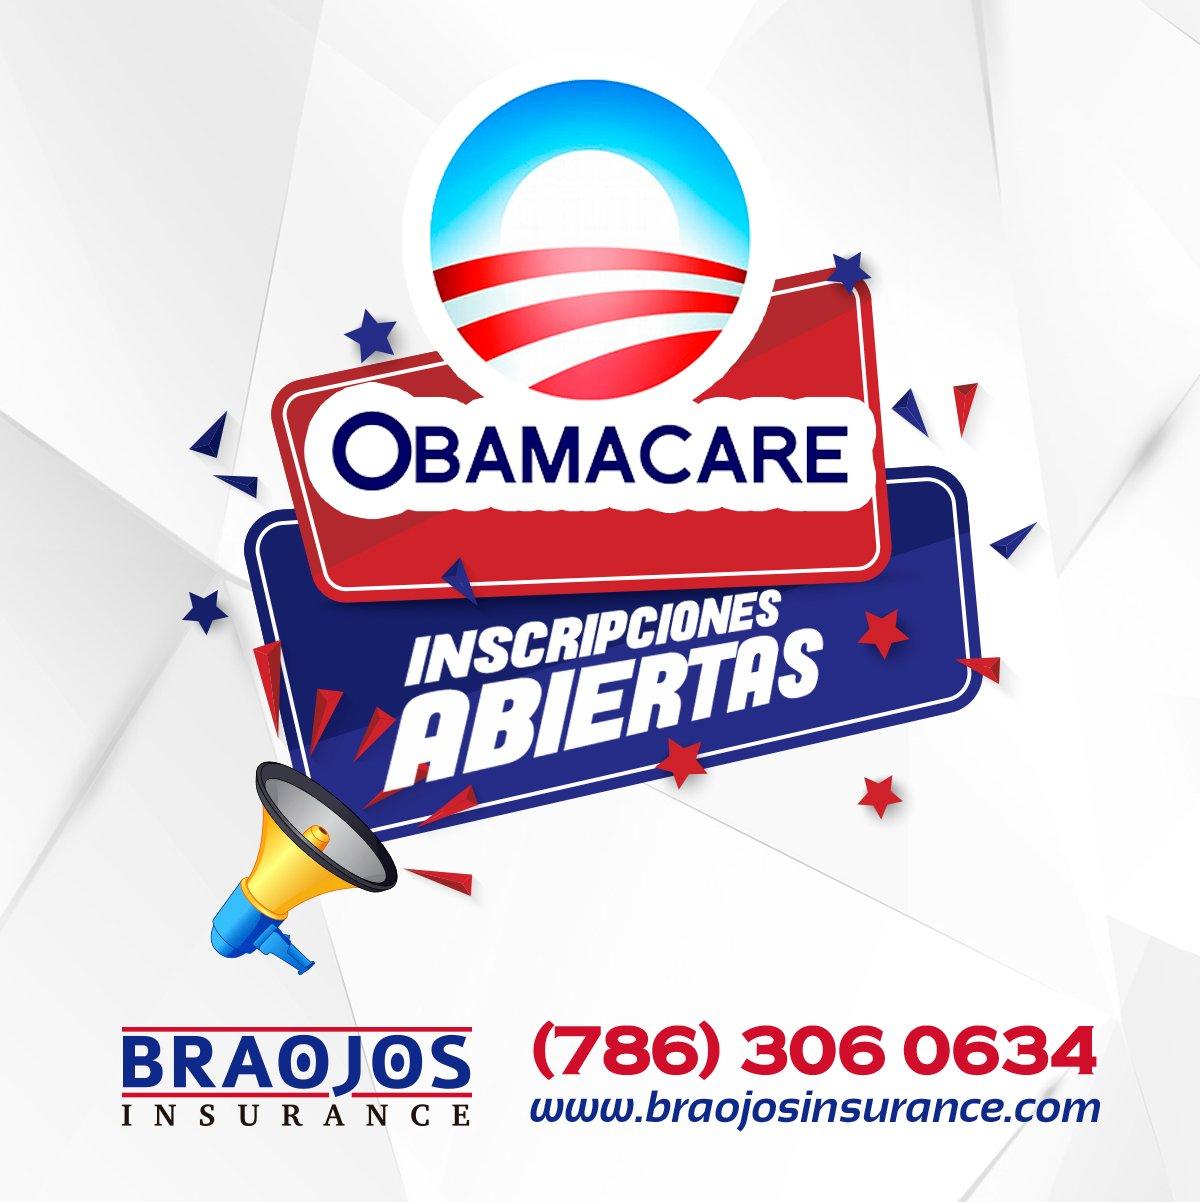 Como me inscribo al Obamacare